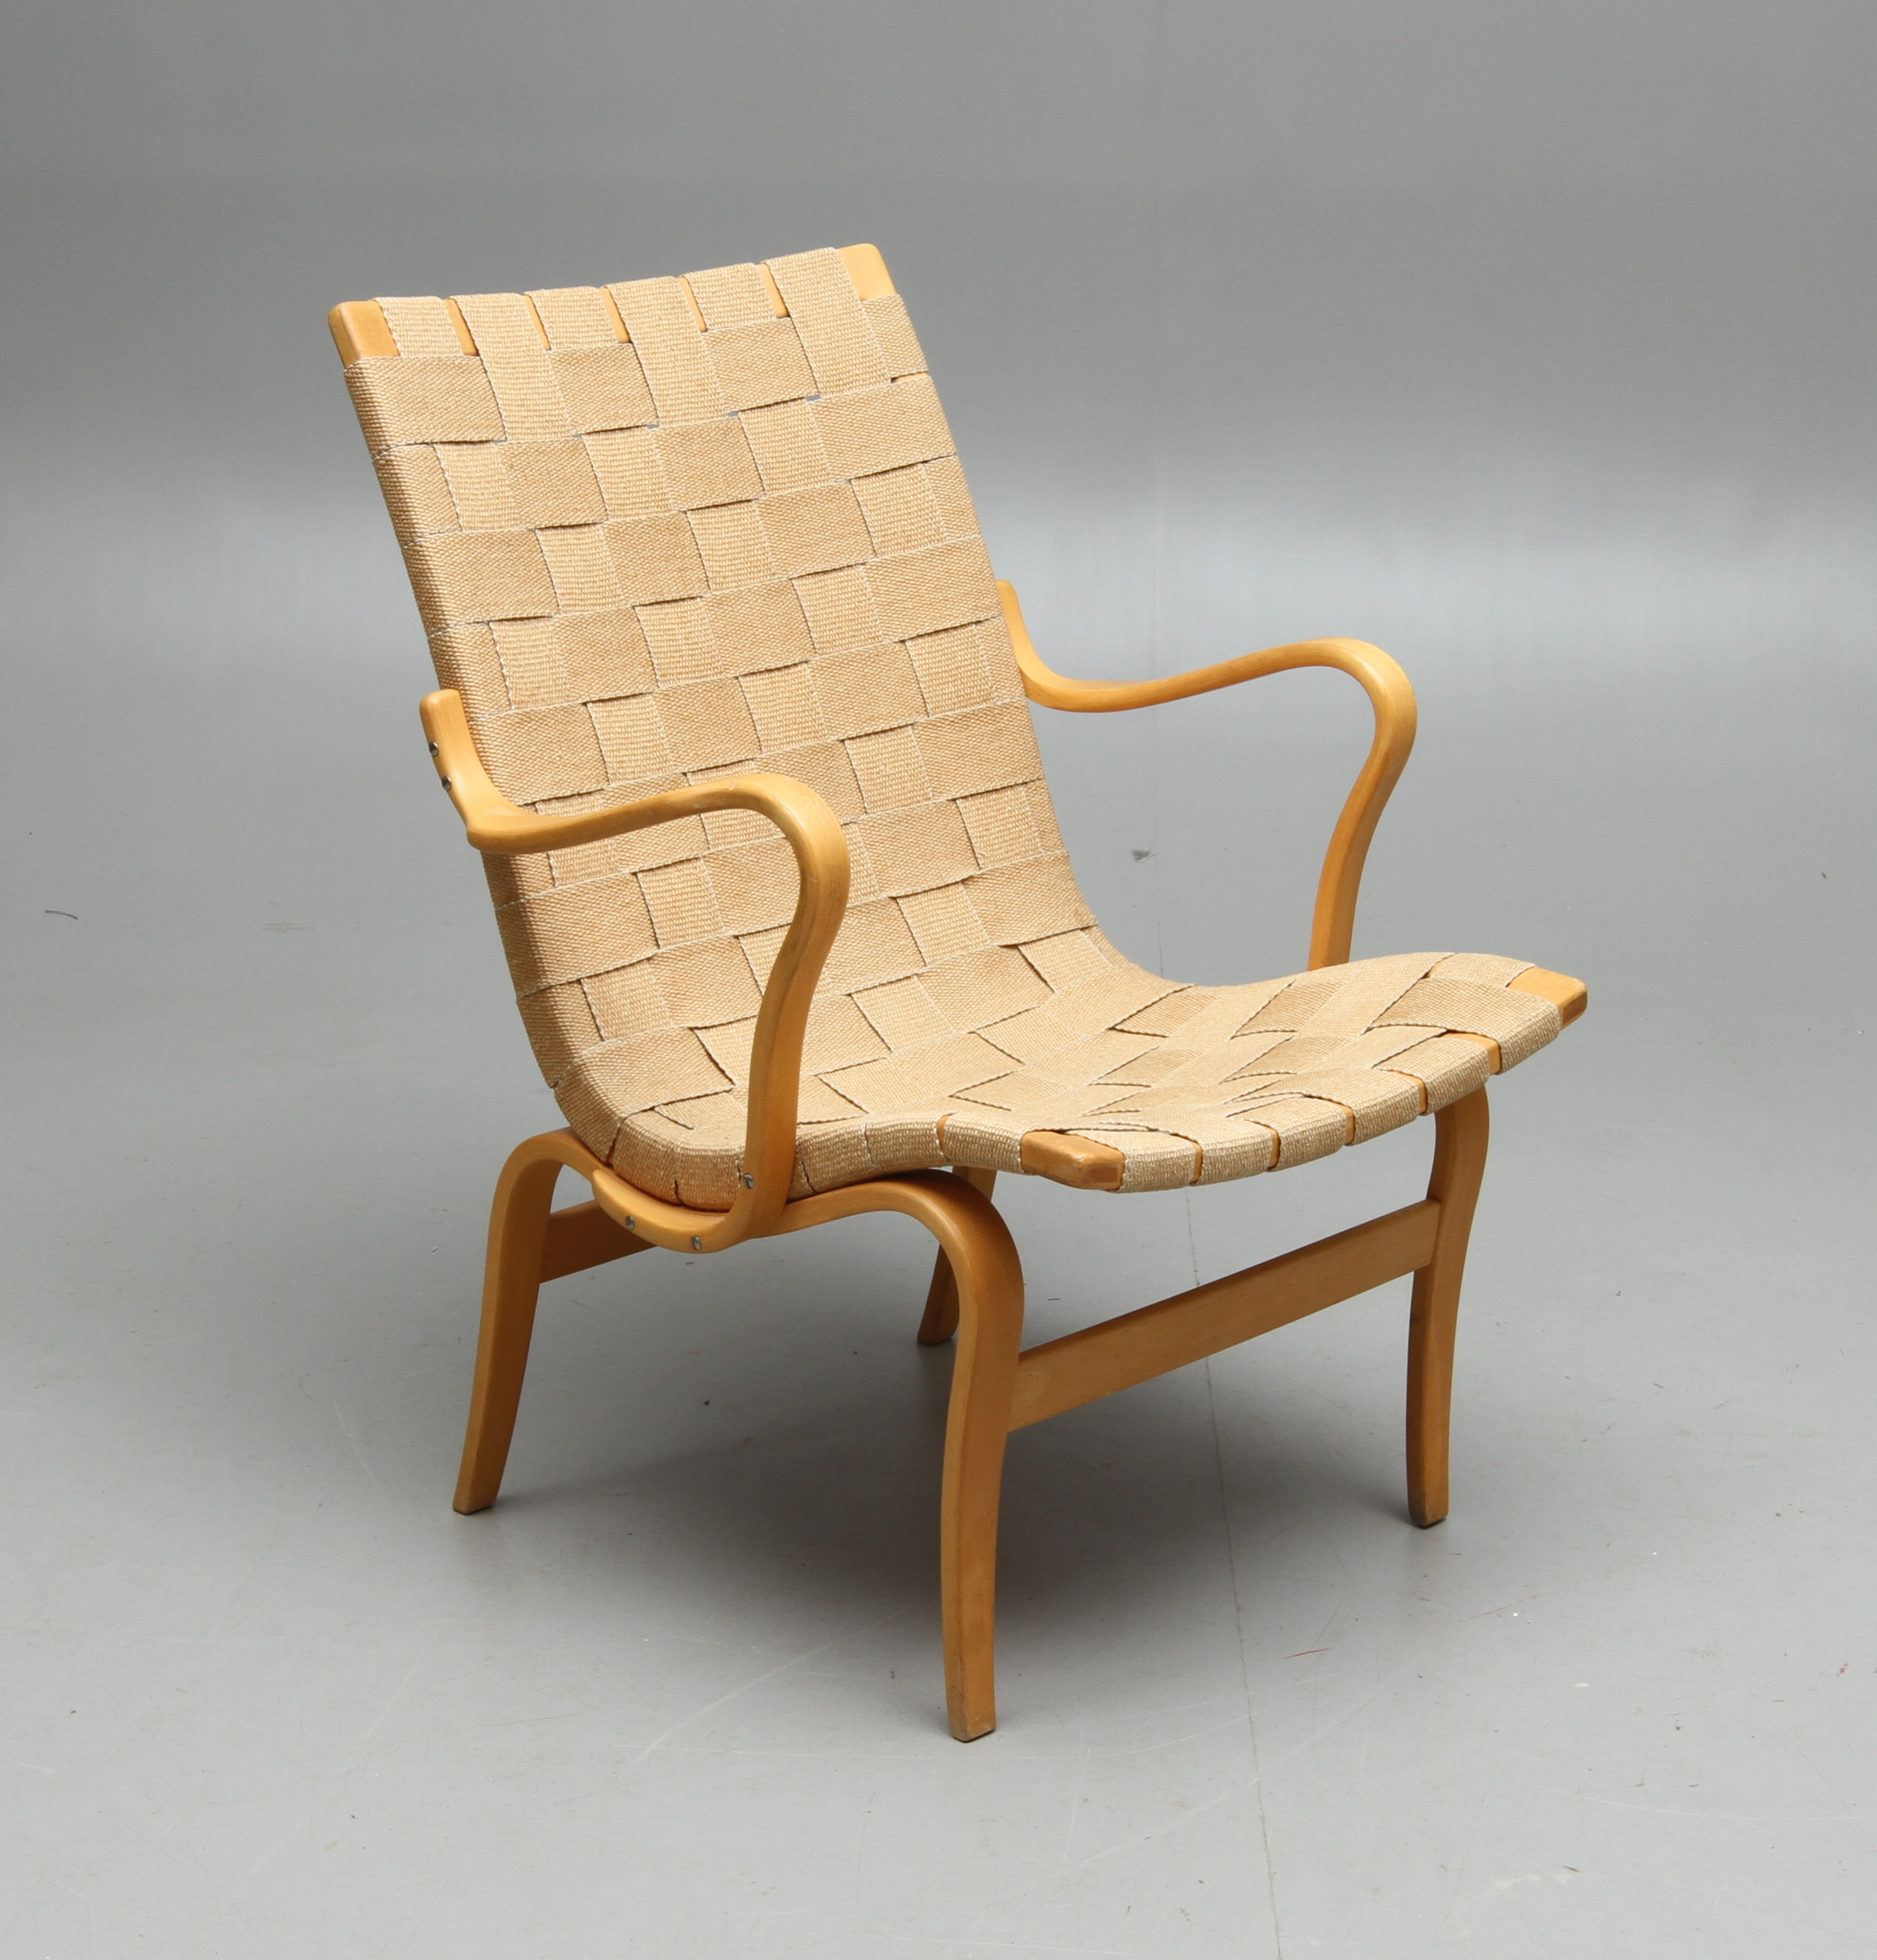 "Images for 38280 FåTÖLJ,""Eva"", Bruno Mathsson, Karl Mathsson 1976 u2013 Auctionet"